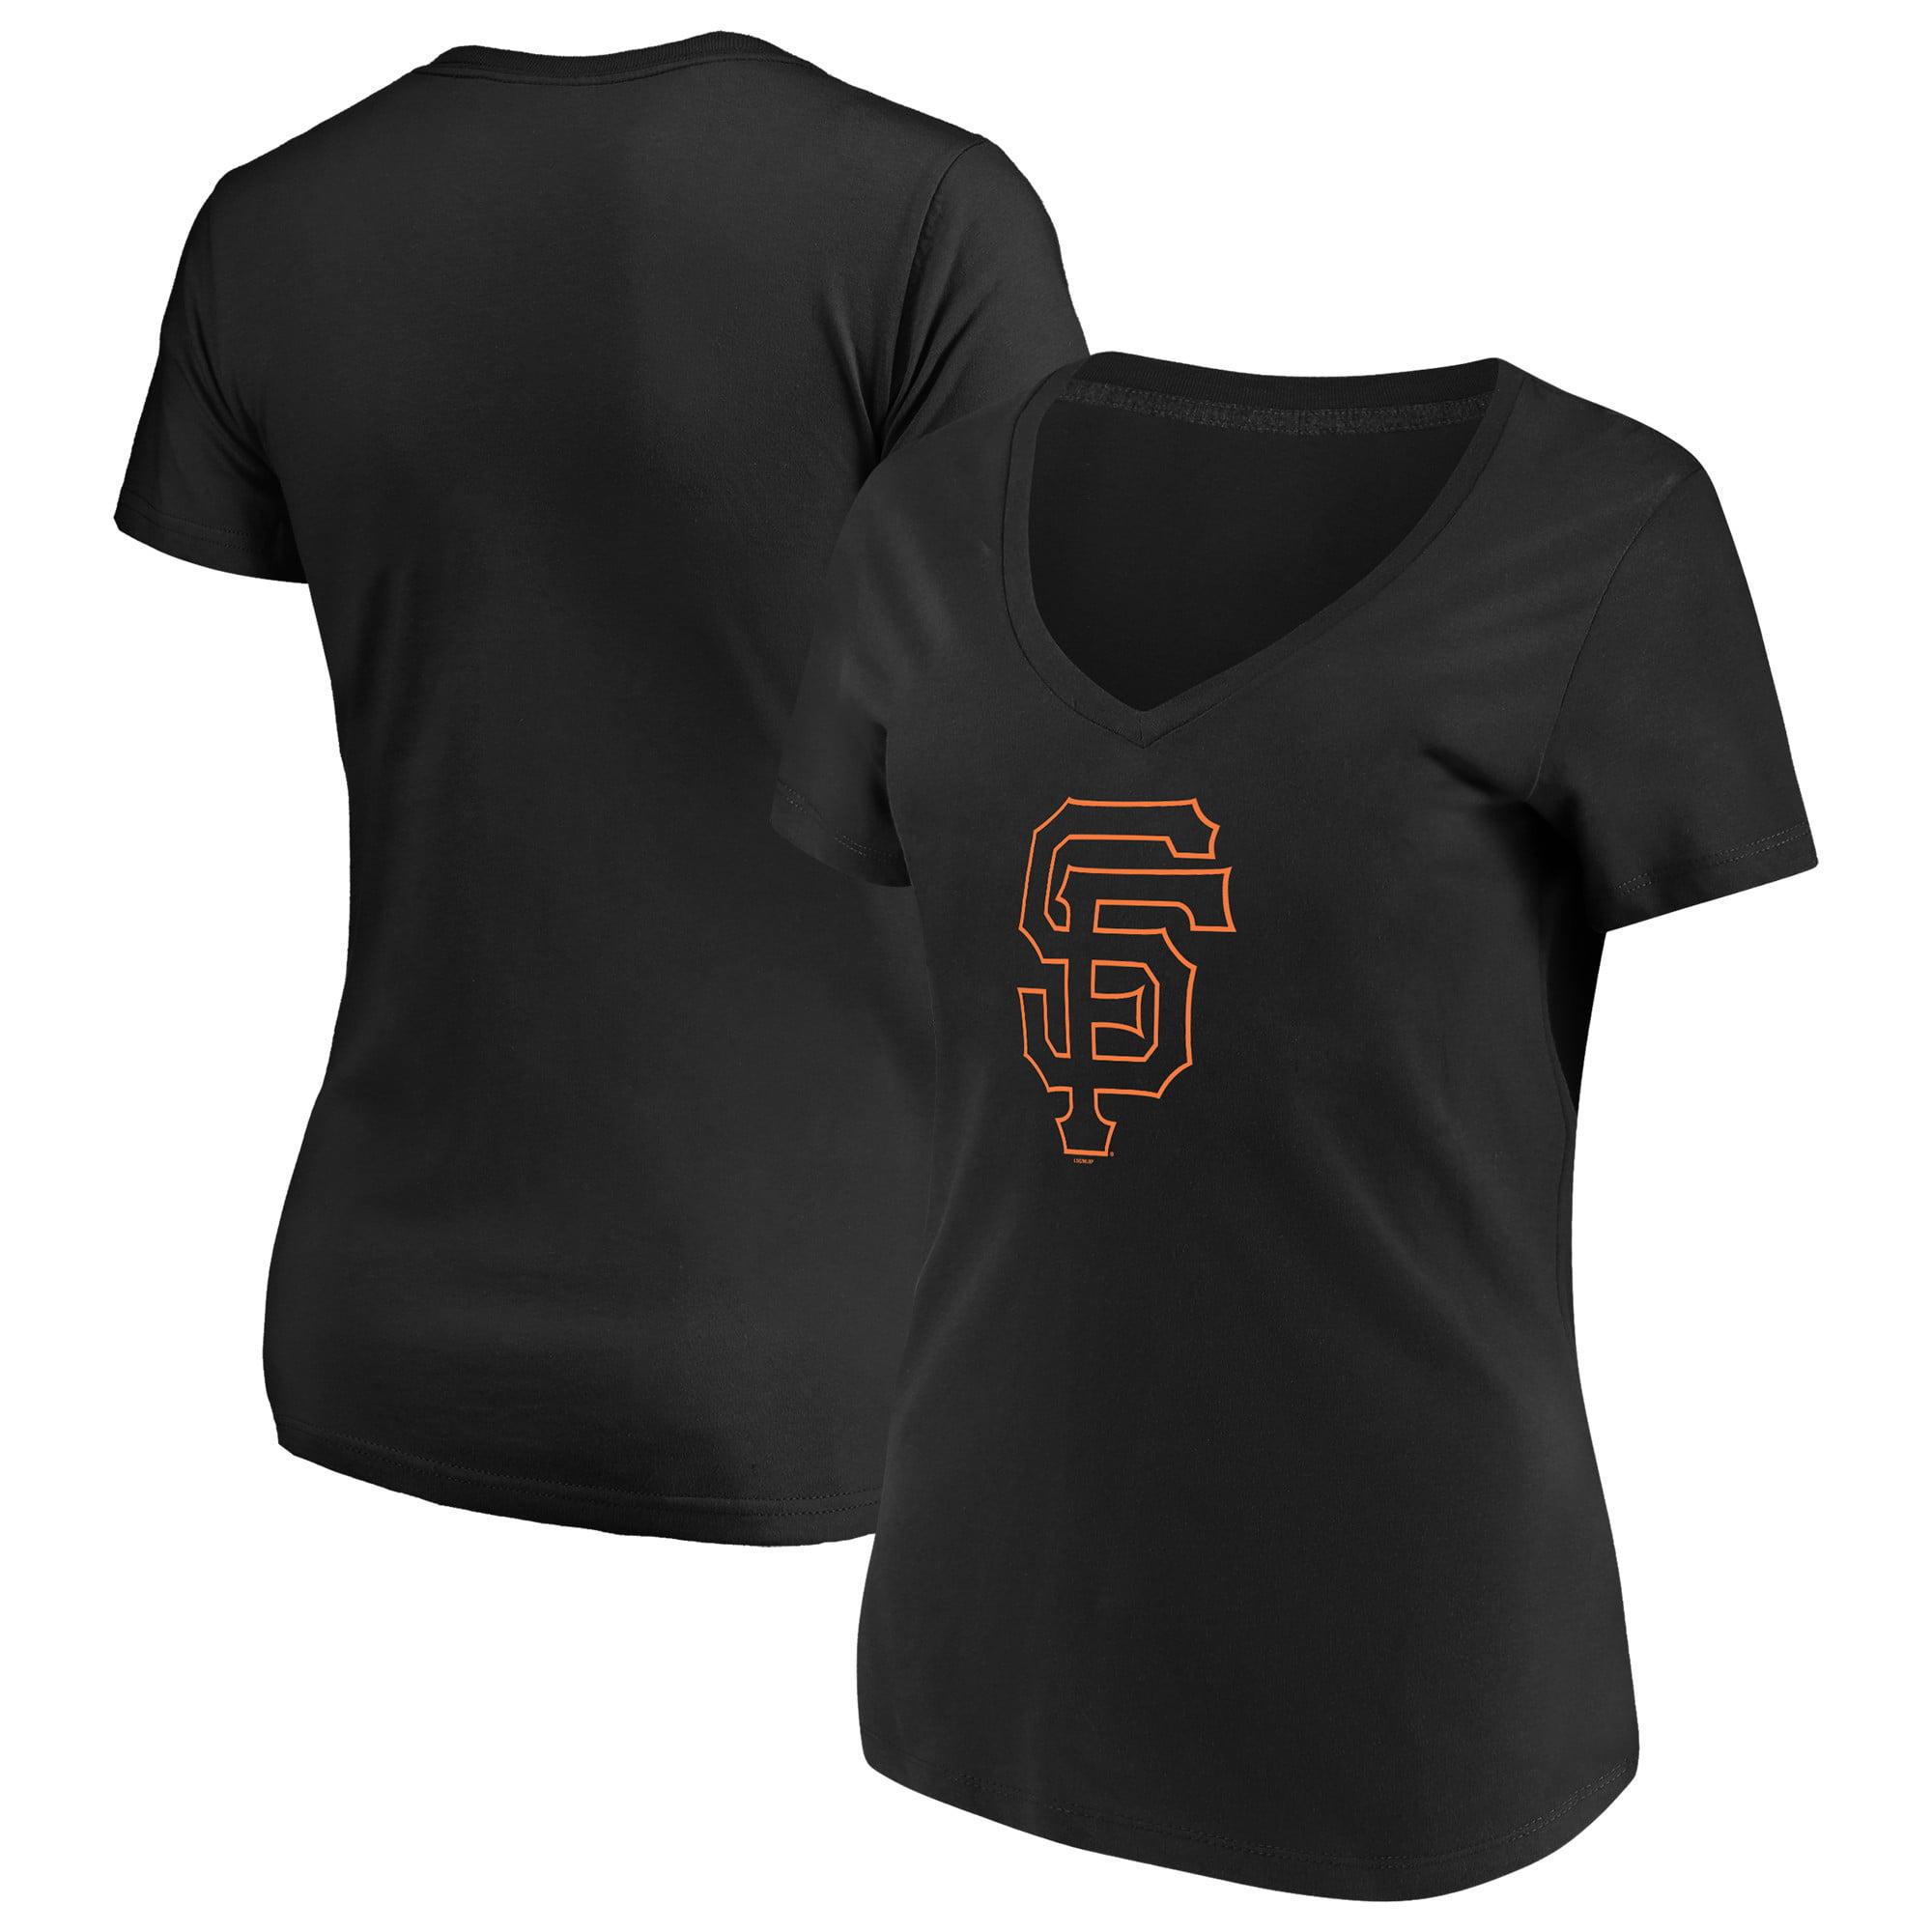 Women's Majestic Black San Francisco Giants Top Ranking V-Neck T-Shirt